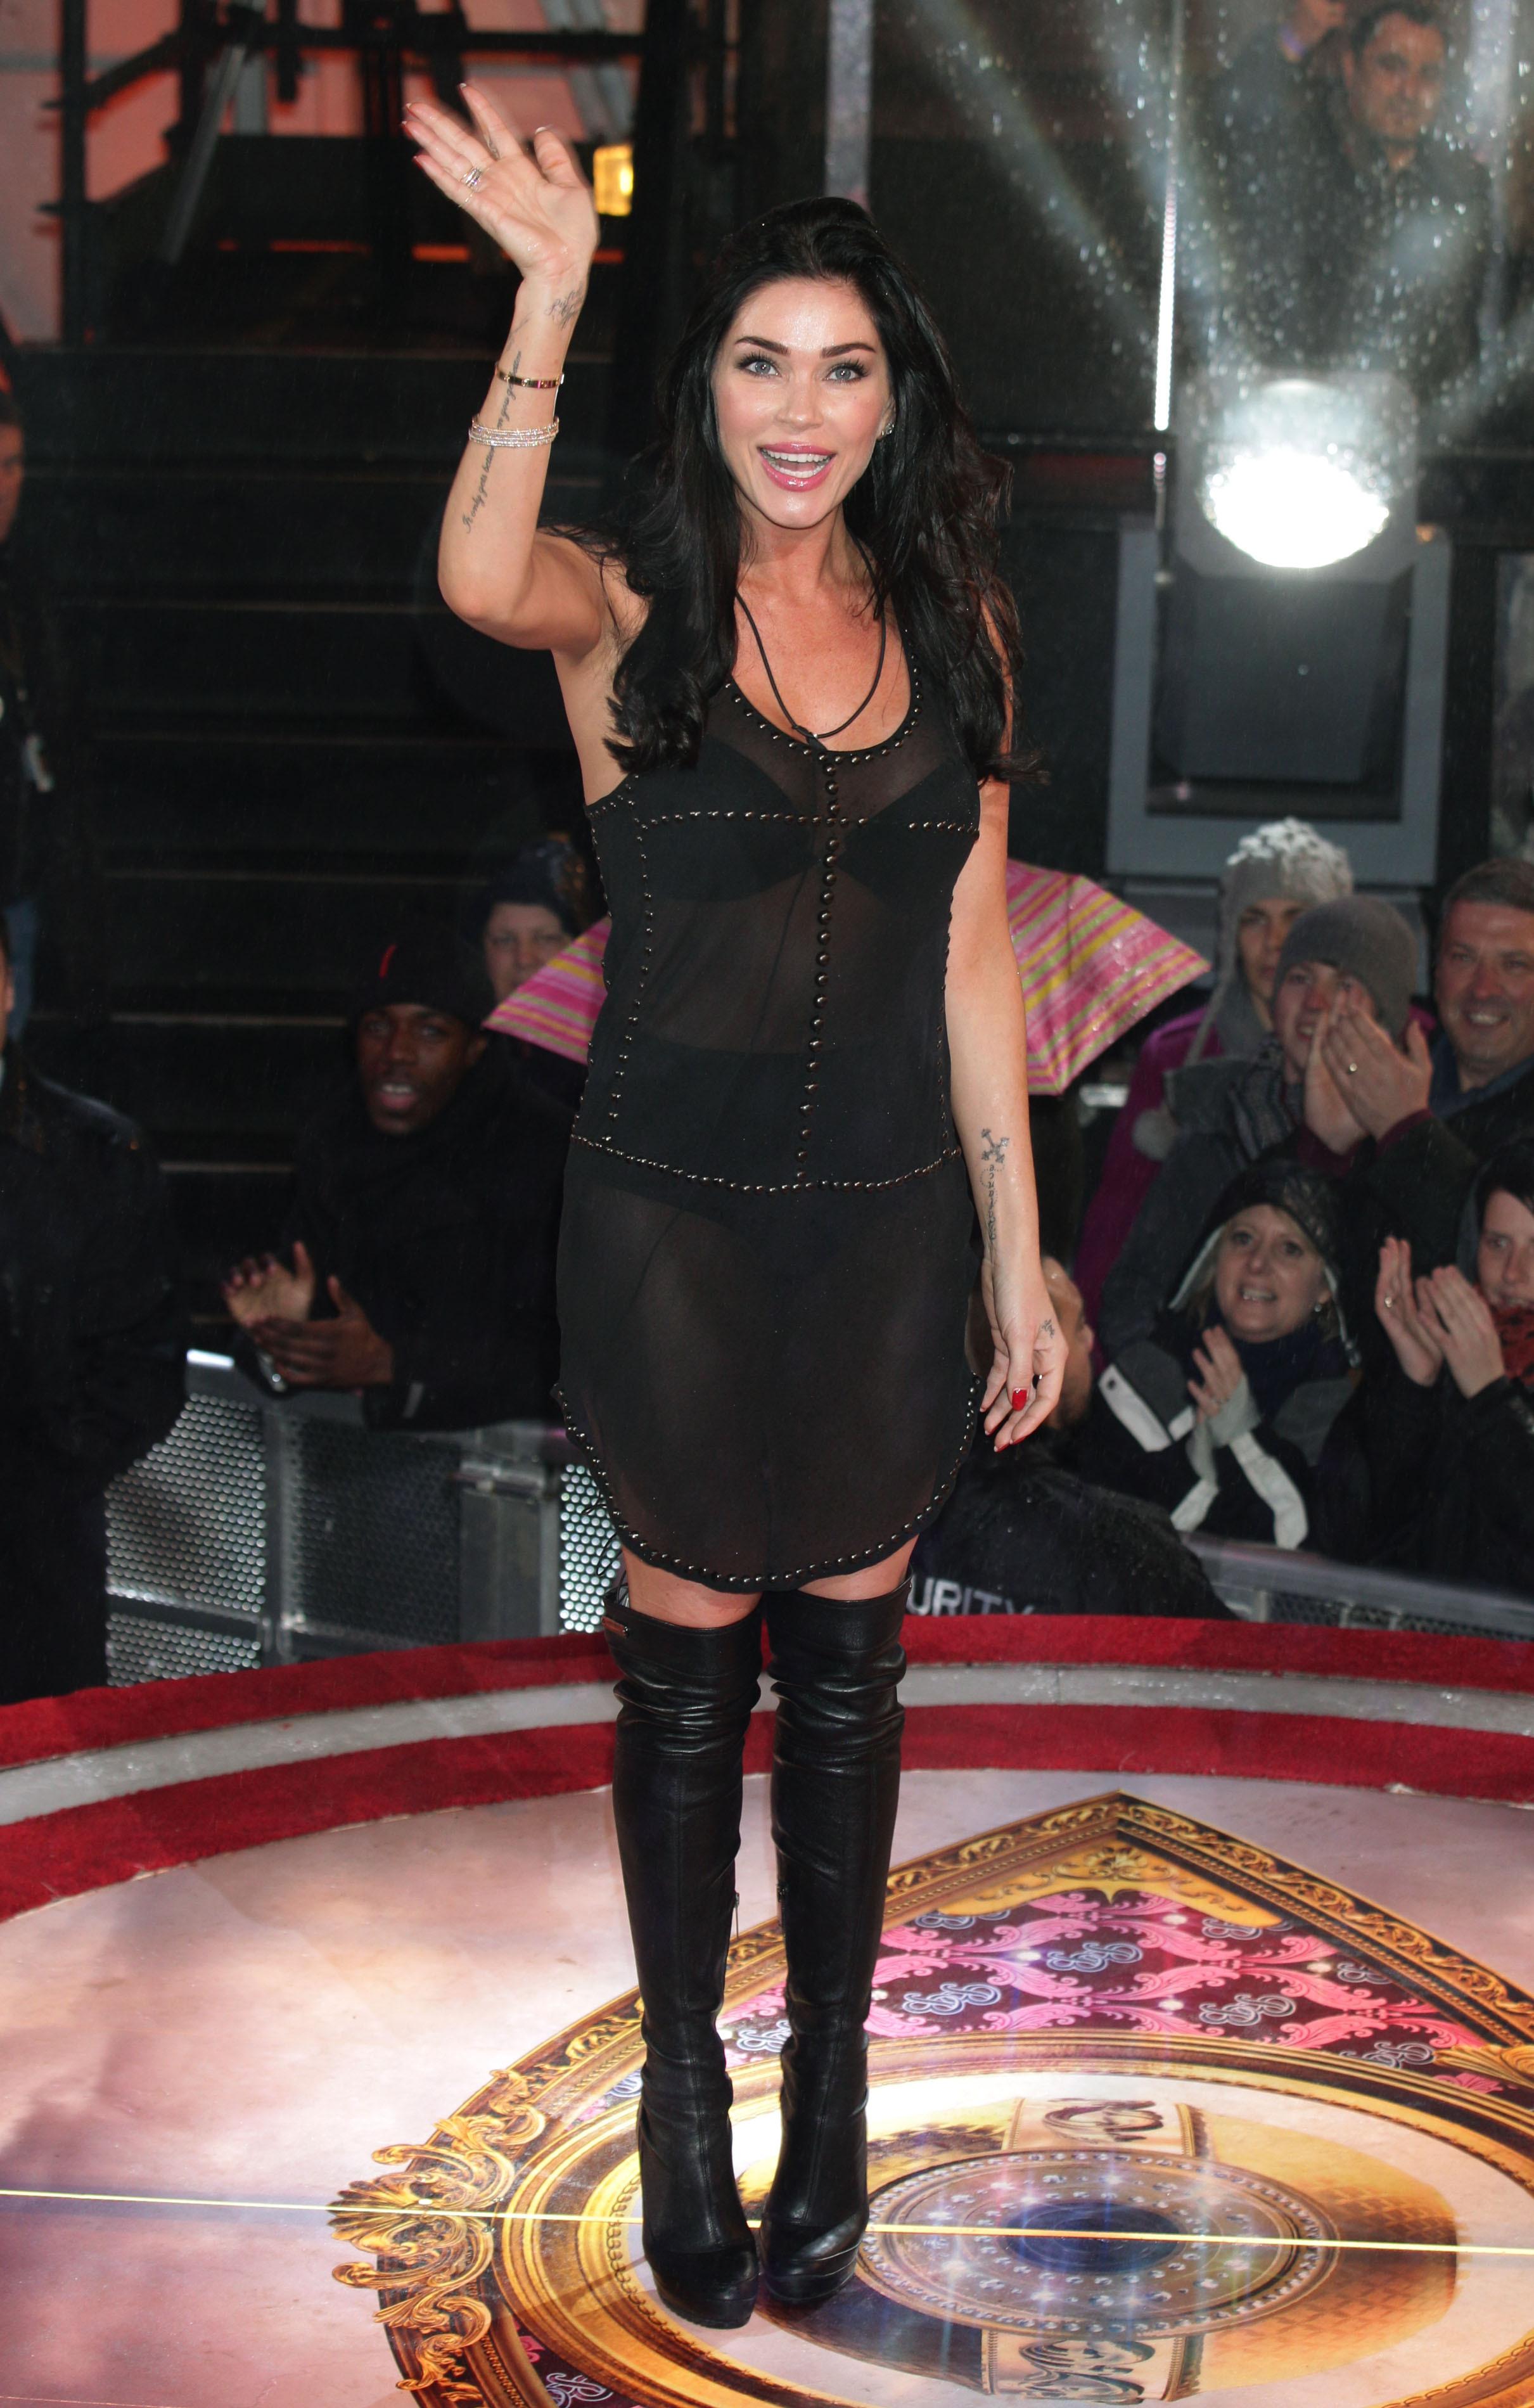 Celebrity Big Brother 2 (UK) | Big Brother Wiki | FANDOM ...